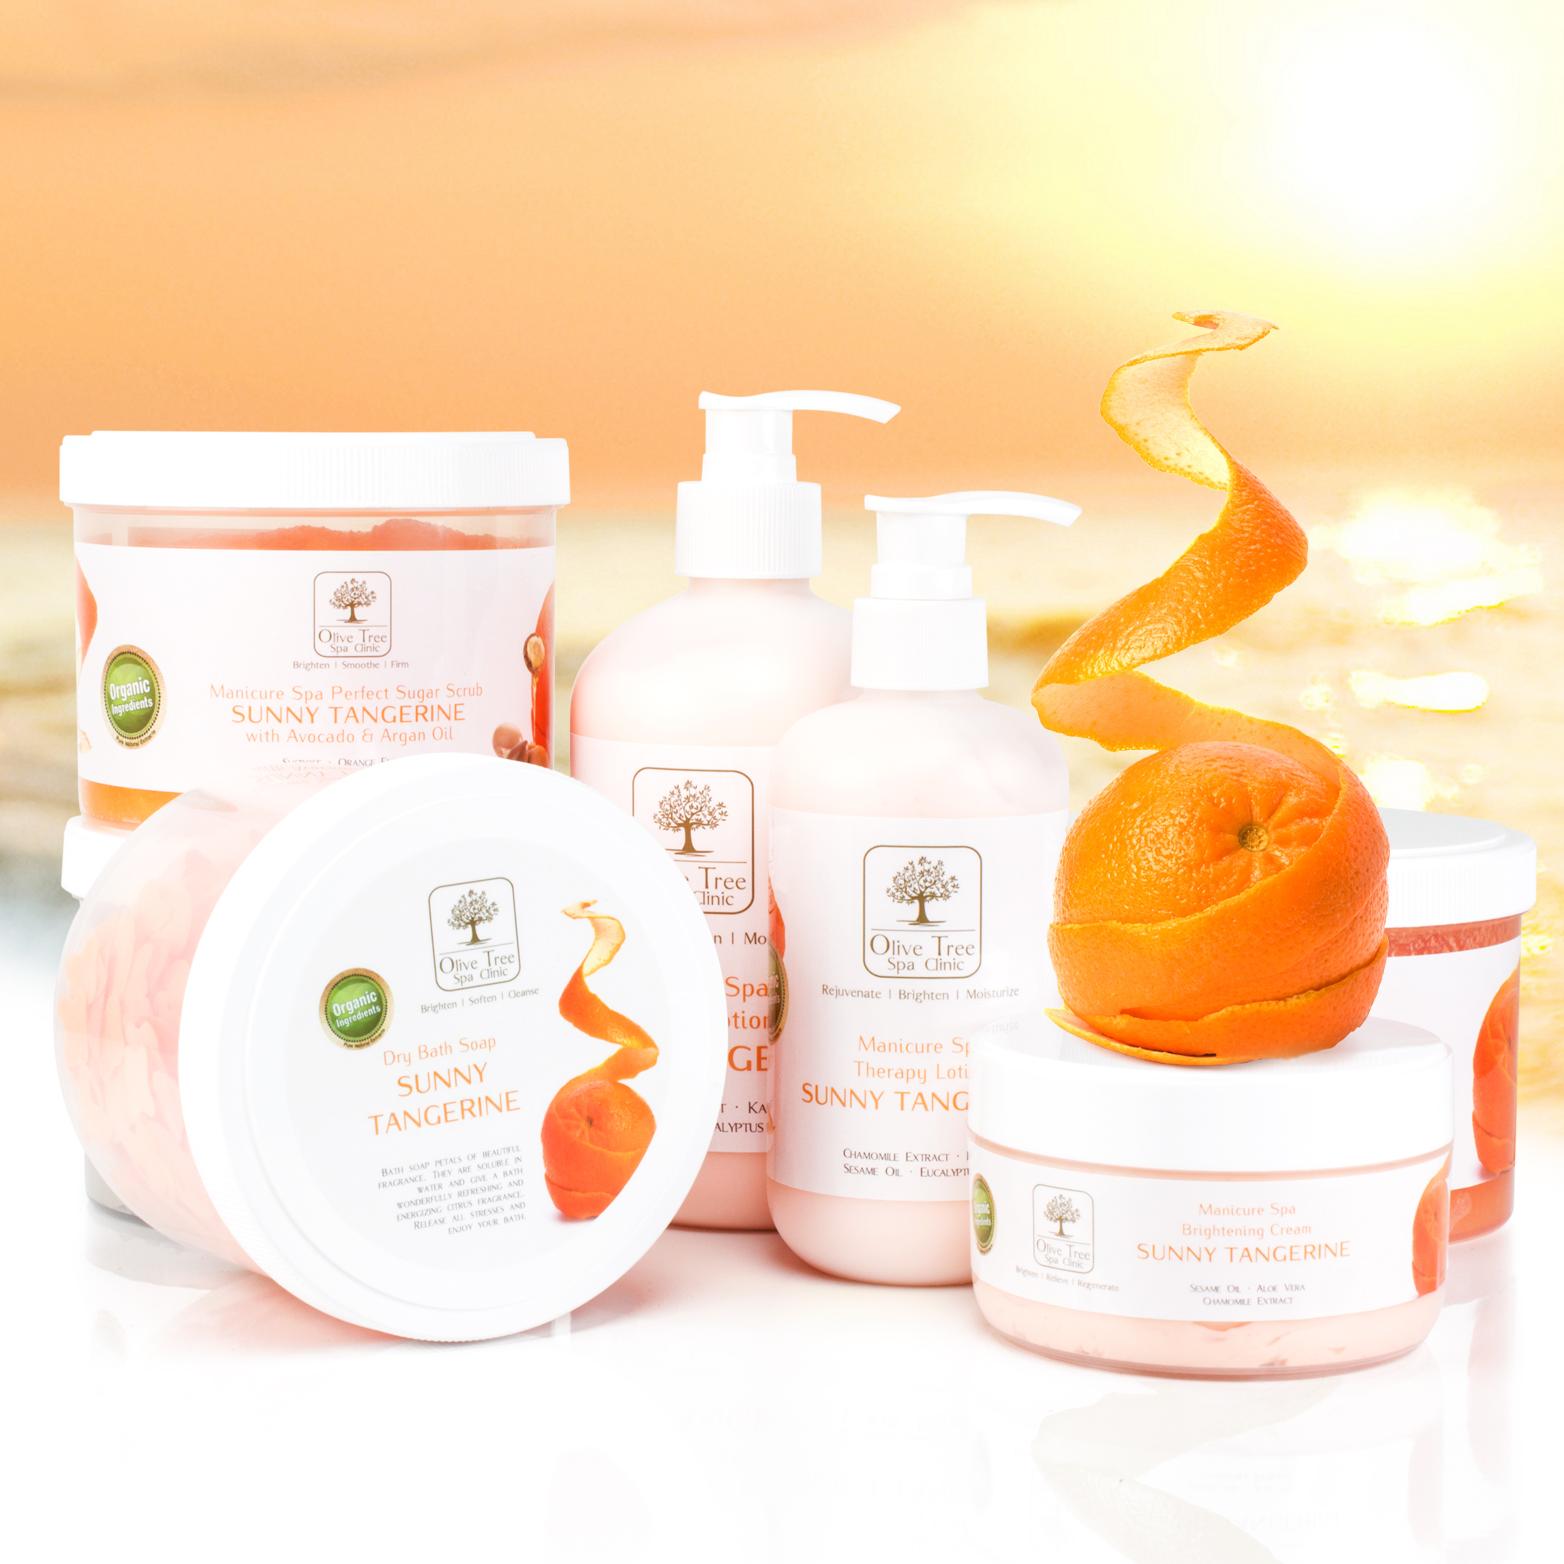 Sunny Tangerine